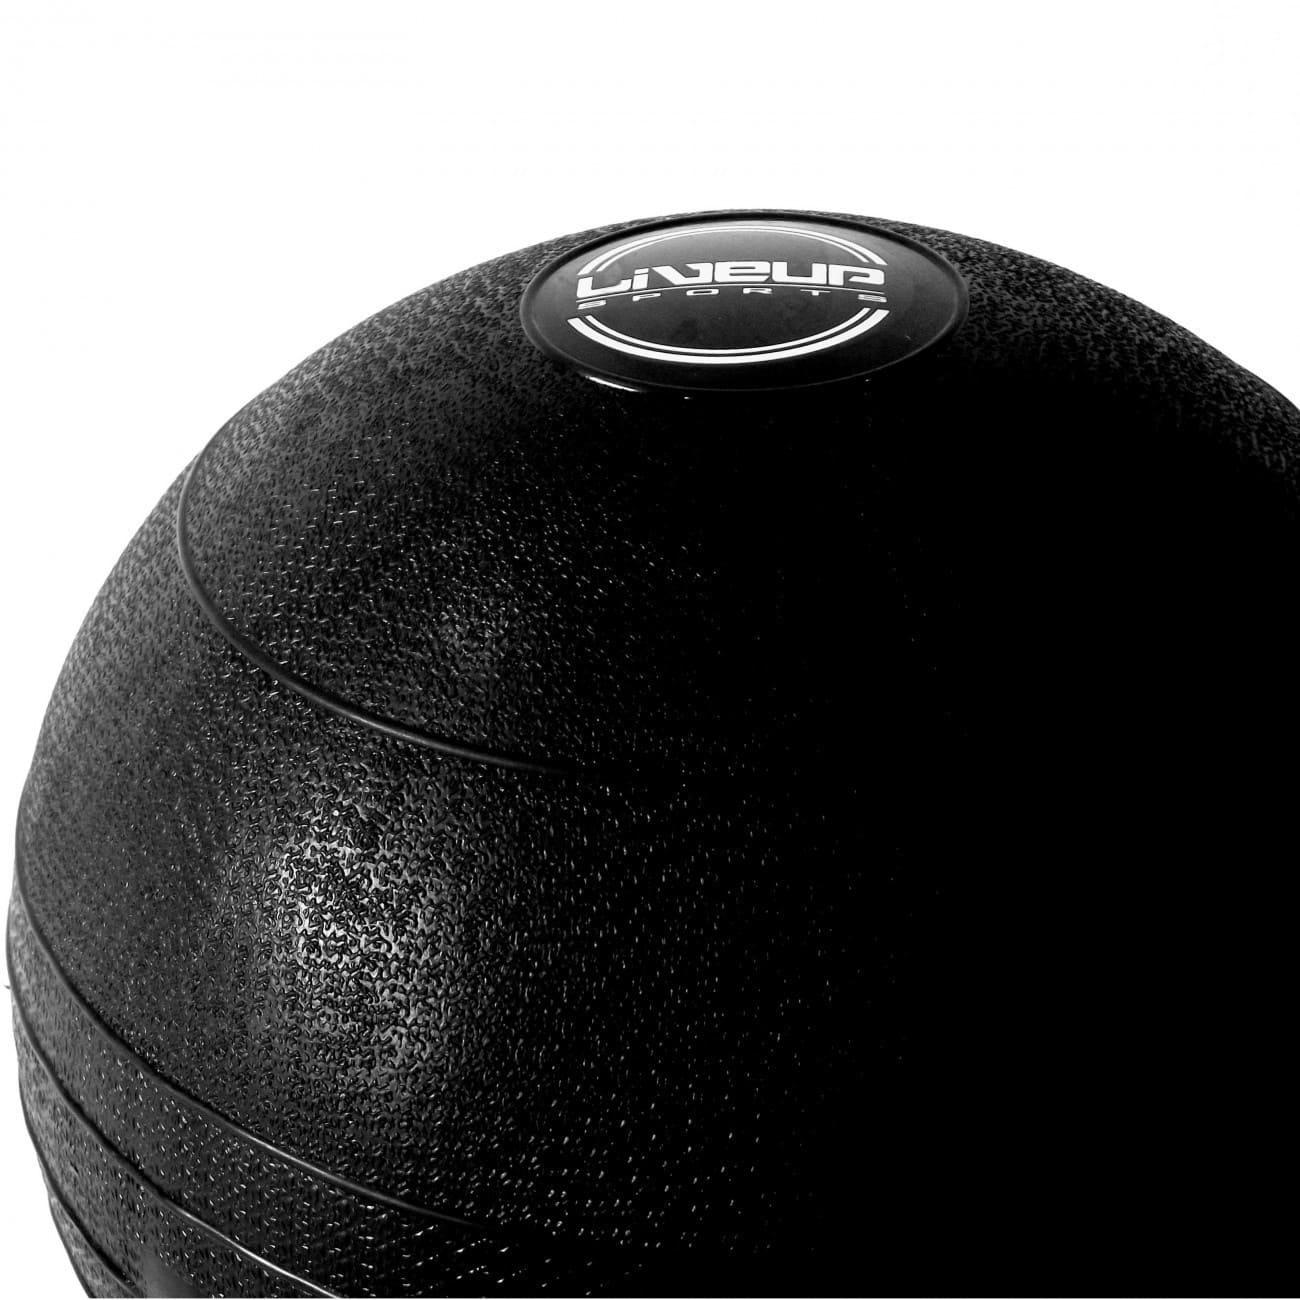 SLAM BALL A - 4KG - LIVEUP SPORTS